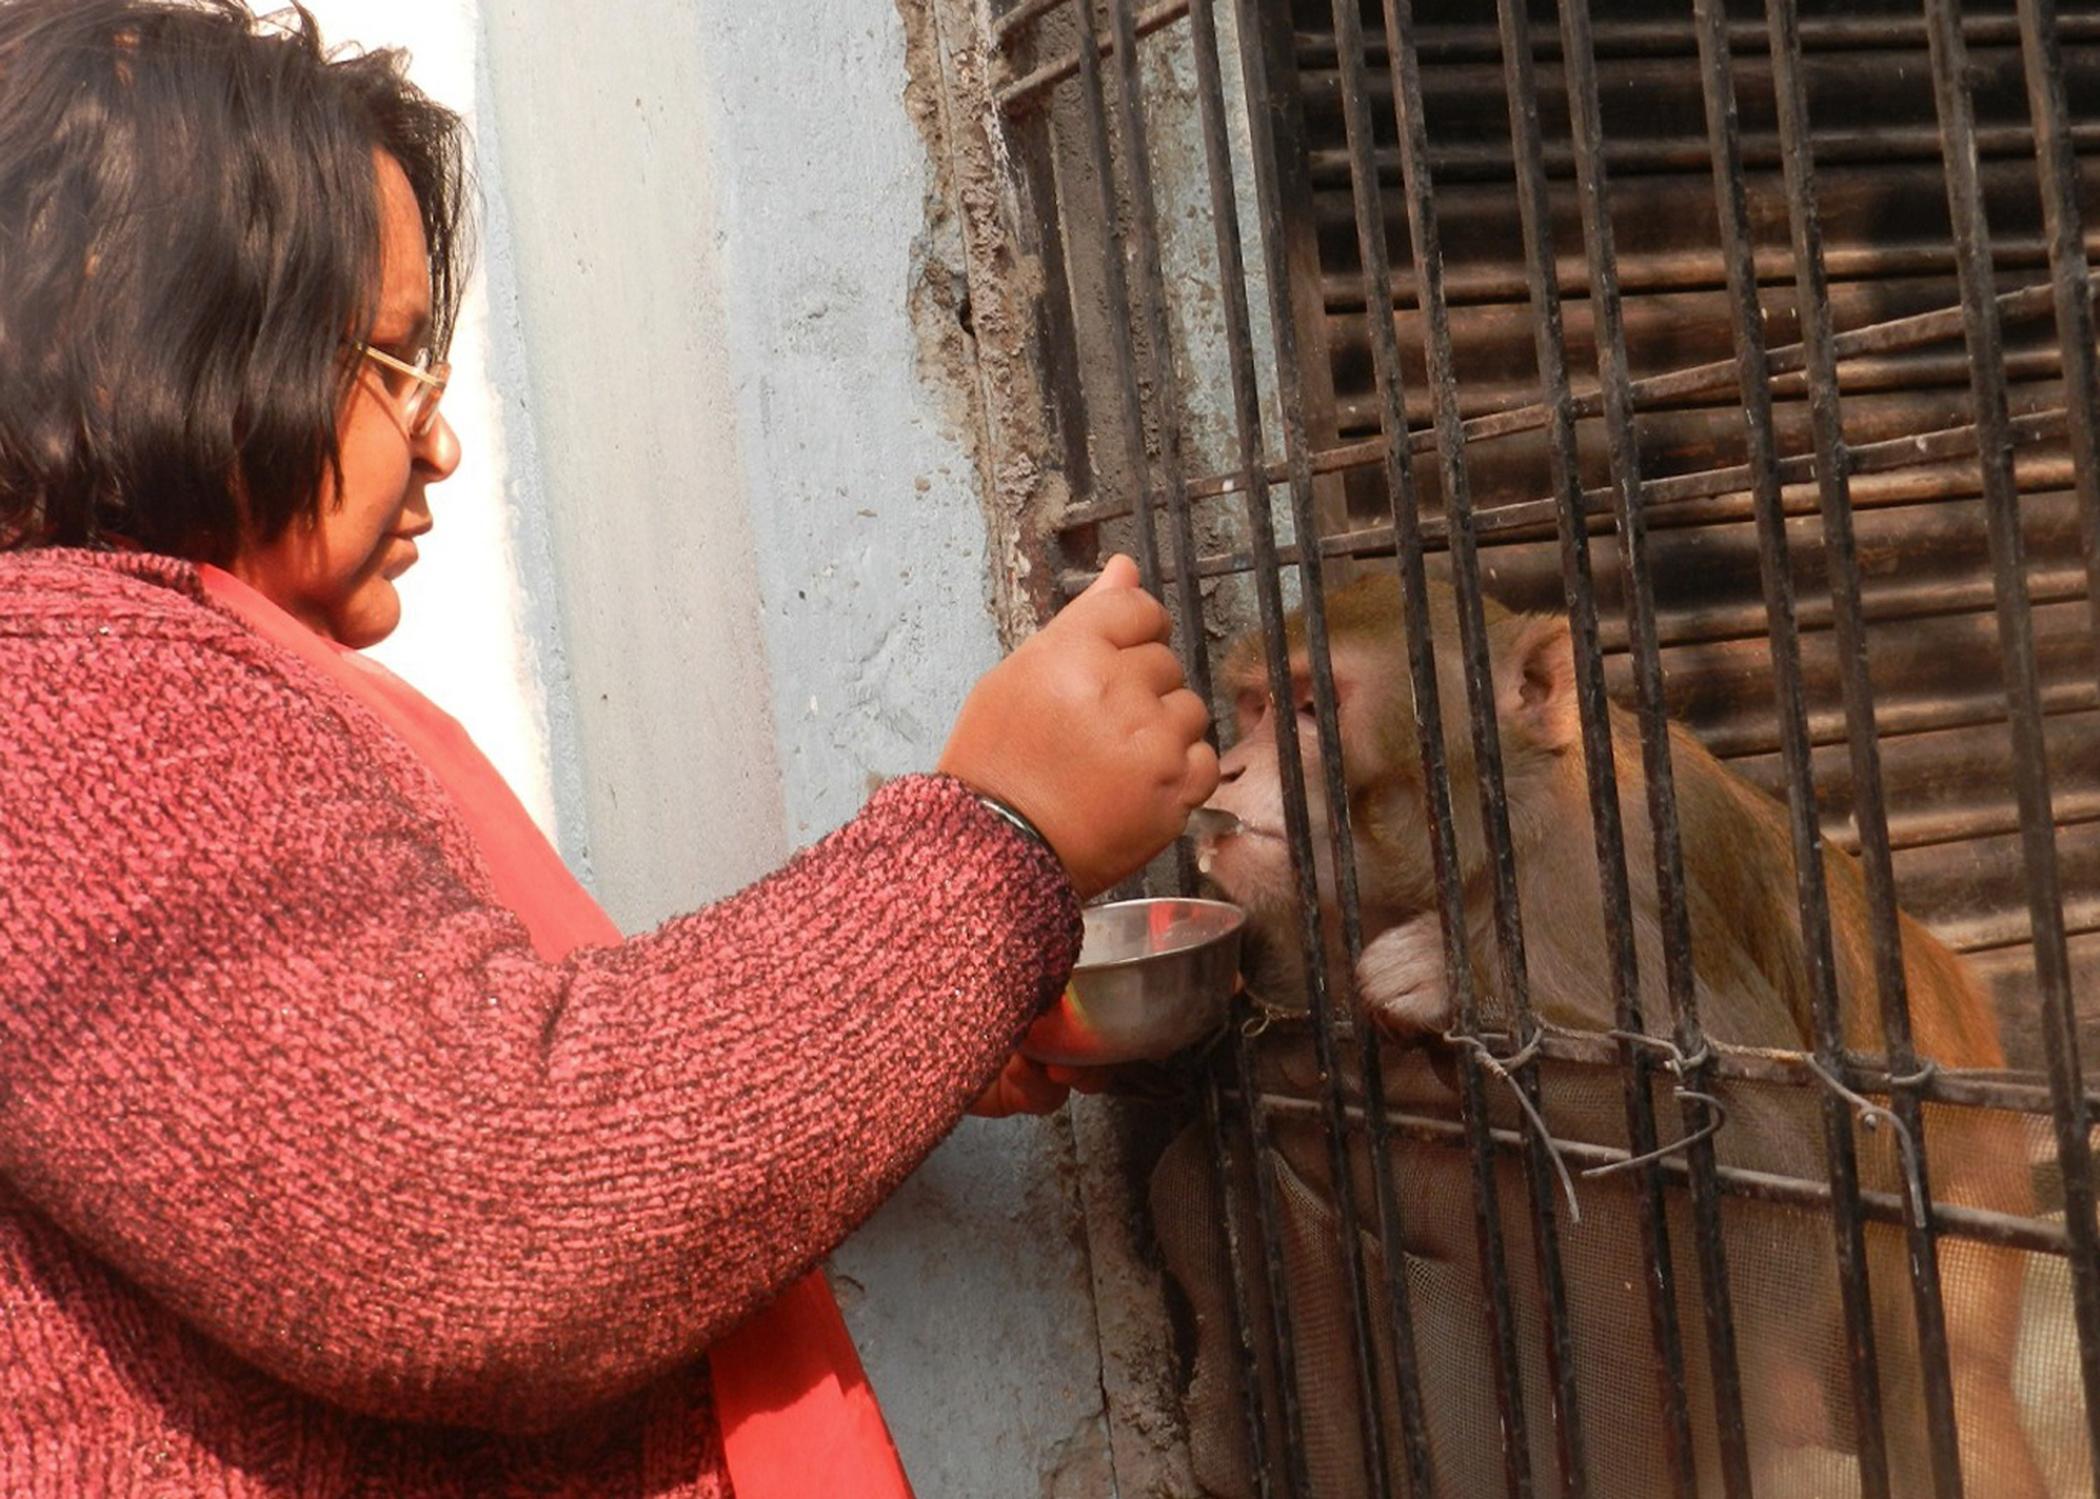 Wife of Brajesh Srivastava, Shabista, feeds their pet monkey Chunmun at their home in Raebareli in northern Uttar Pradesh state, February 16, 2015.